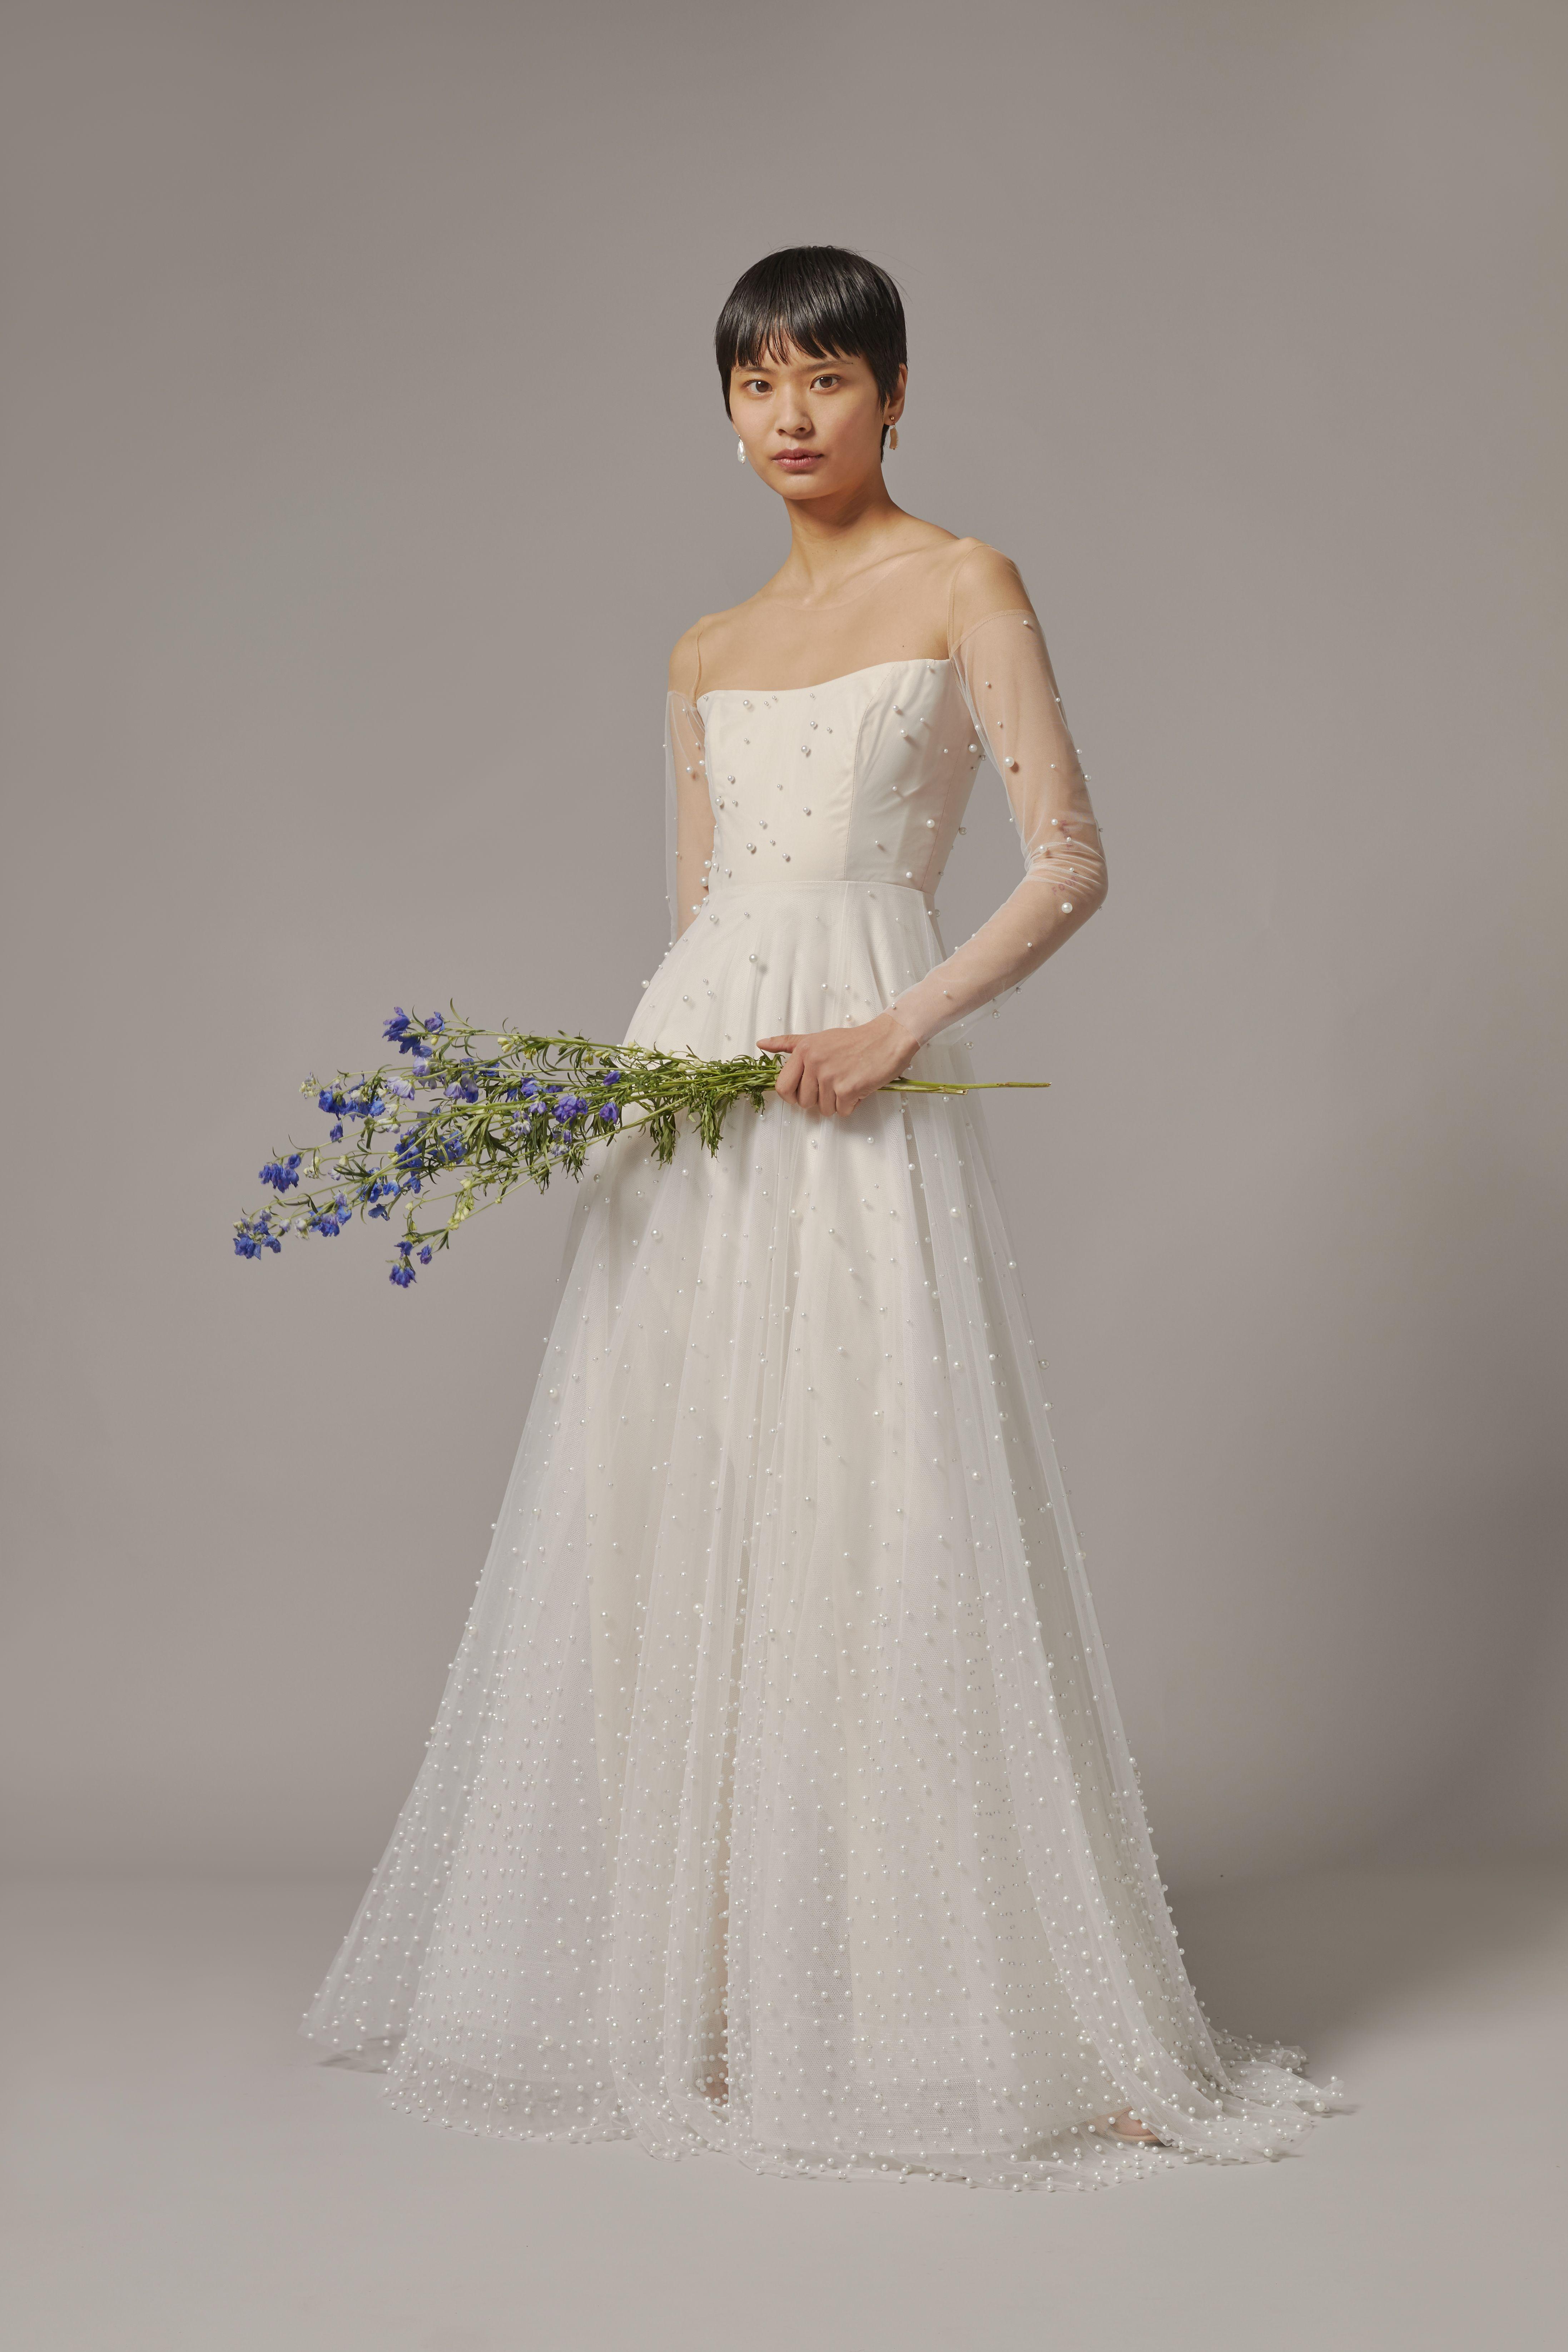 S Earle Popular Wedding Dresses Wedding Dresses Simple Fairy Tale Wedding Dress